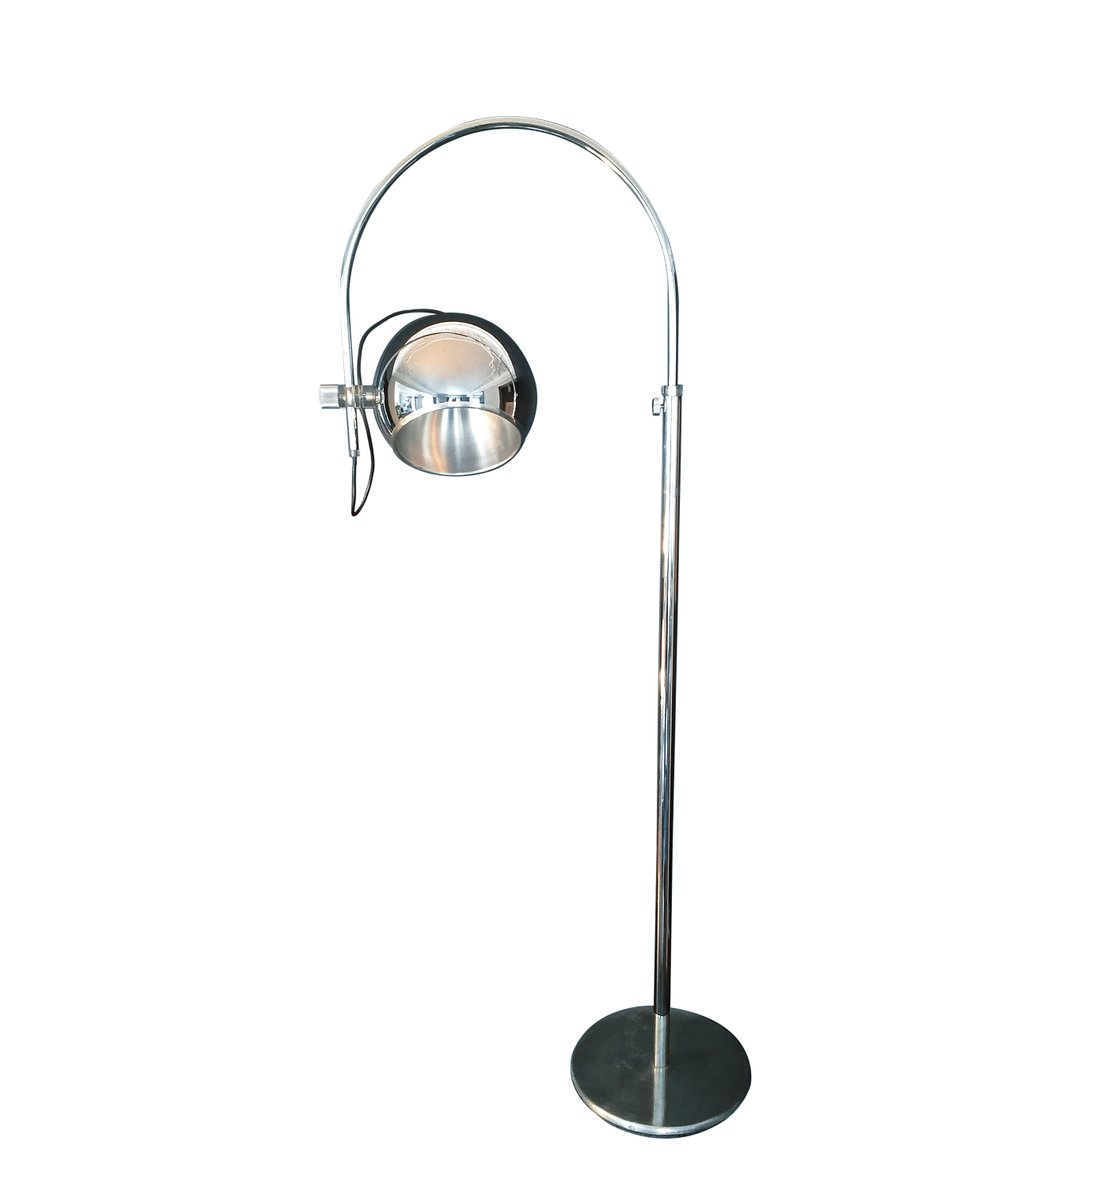 lampadaire arc eye ball en aluminium chrome plexiglas 1960s 1 5 Luxe Lampadaire En Arc Kdh6